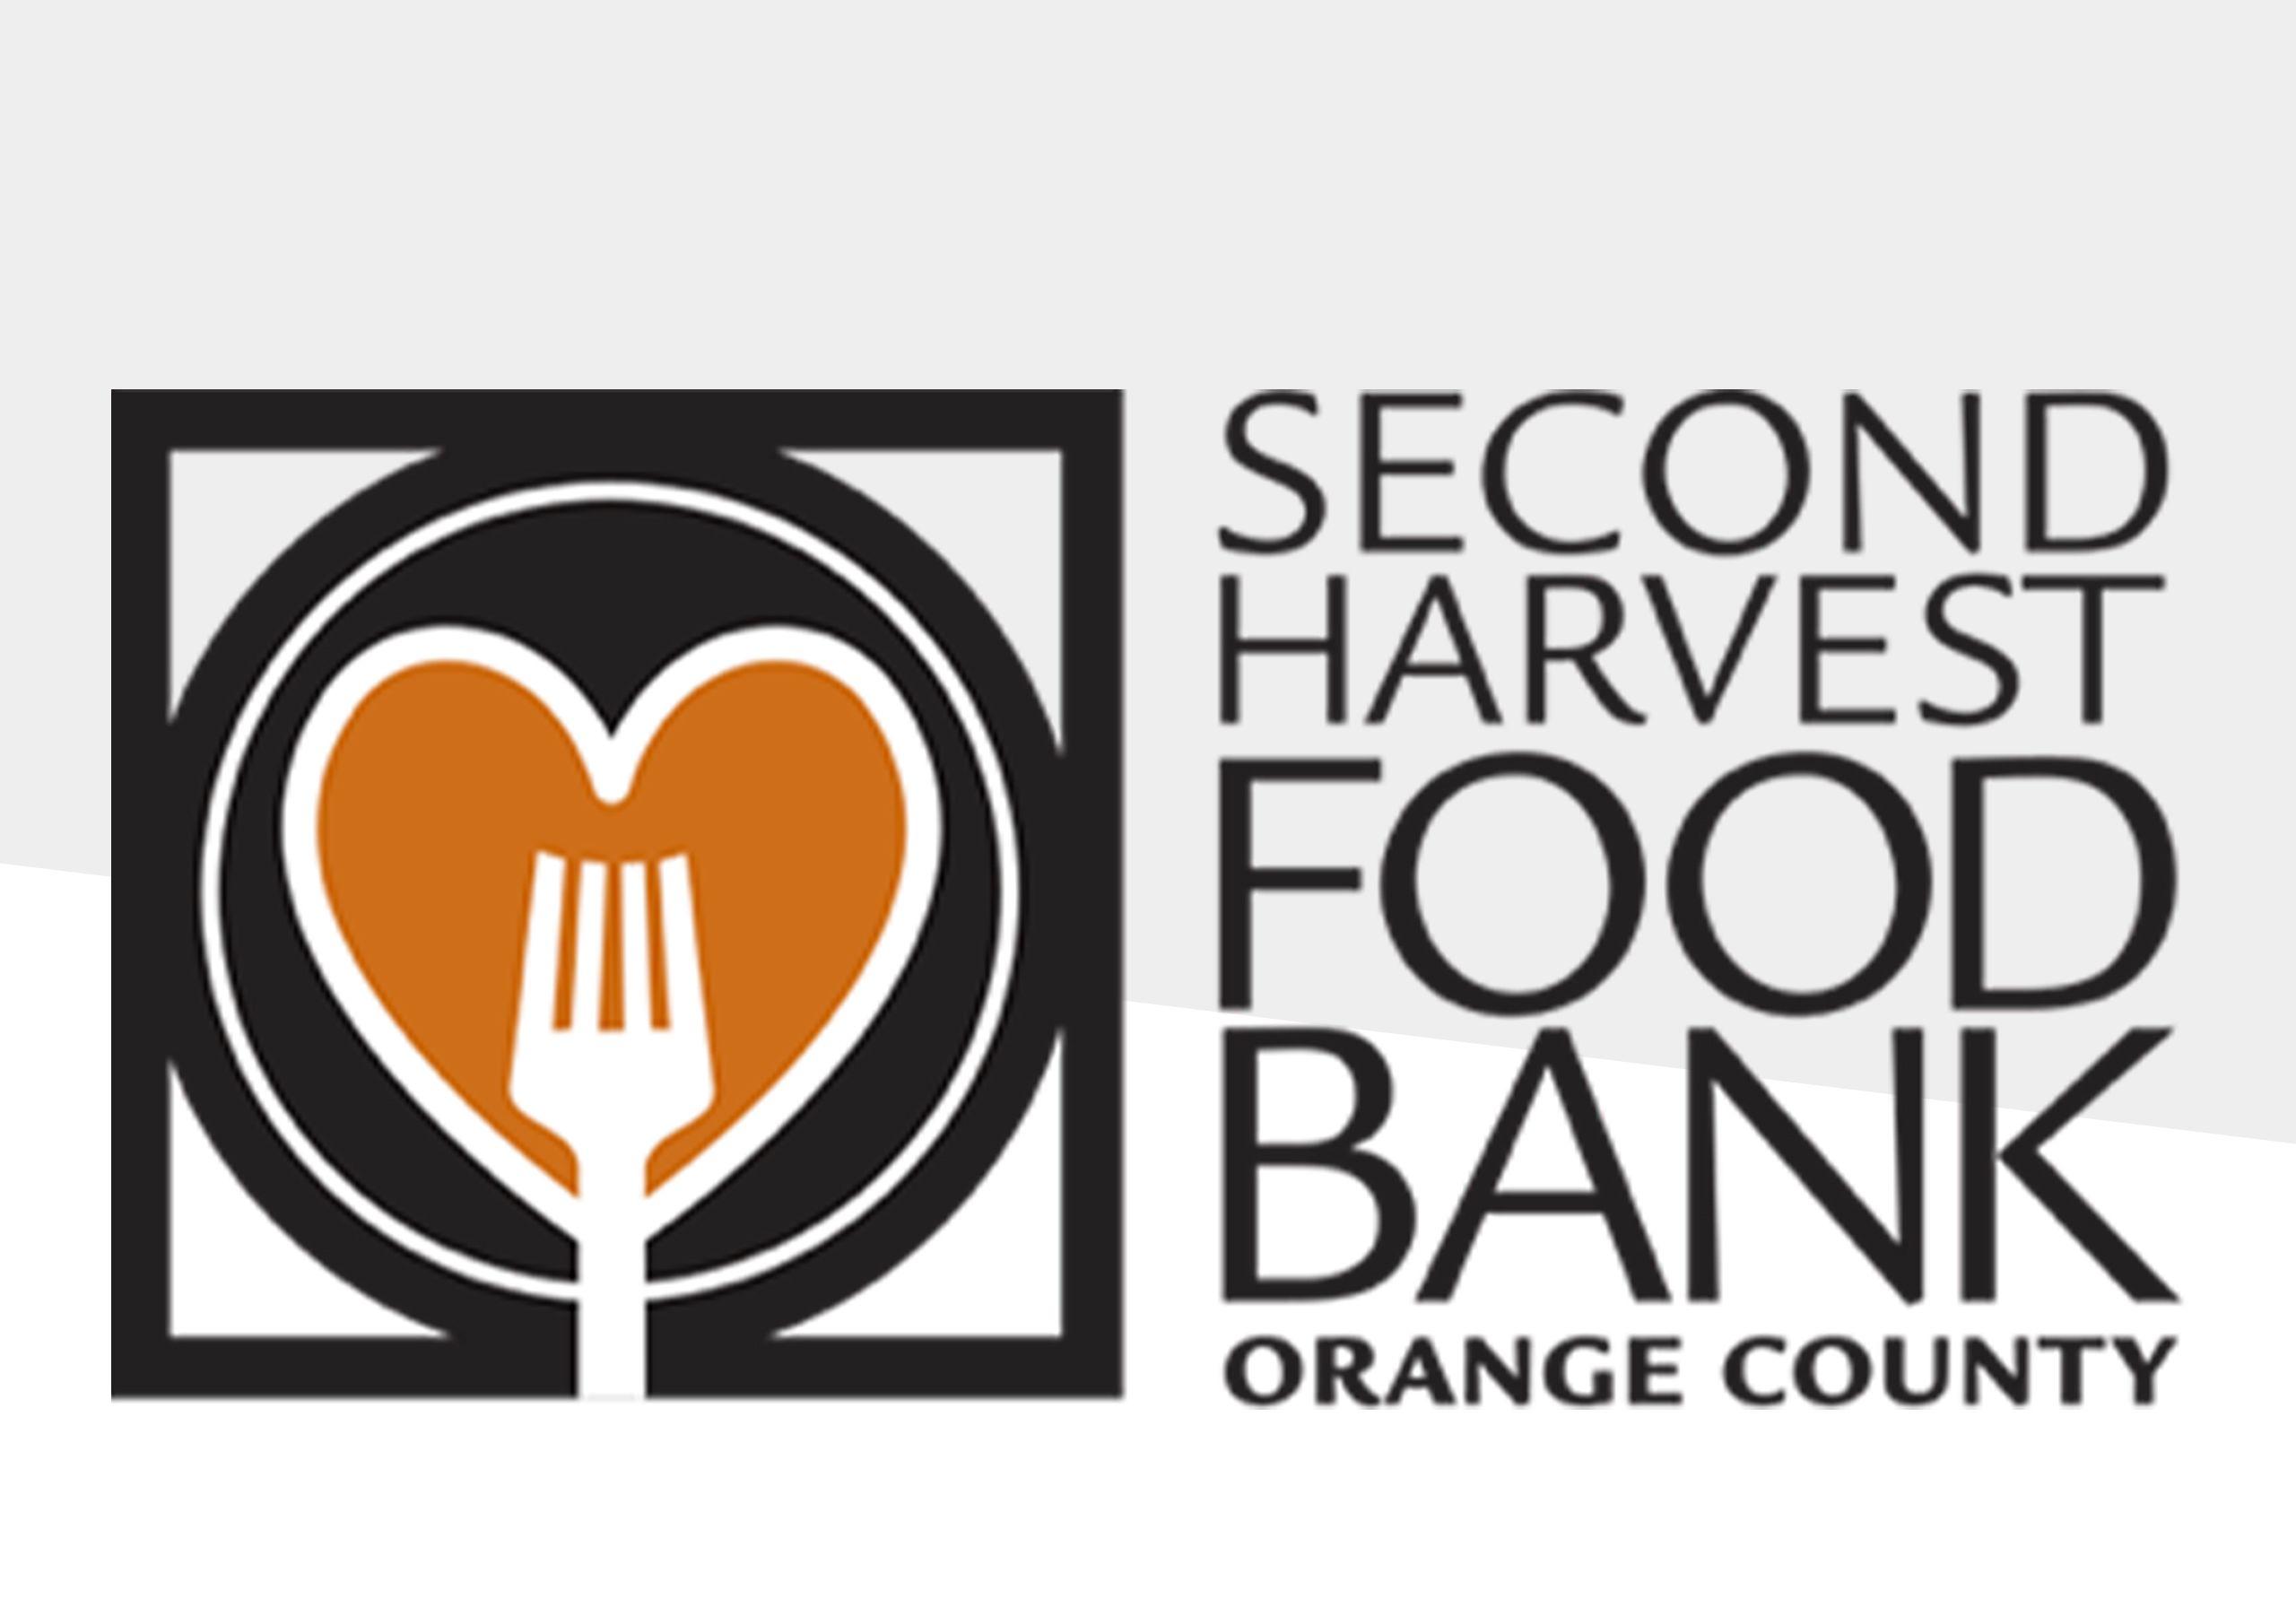 Second Harvest Food Bank Orange County